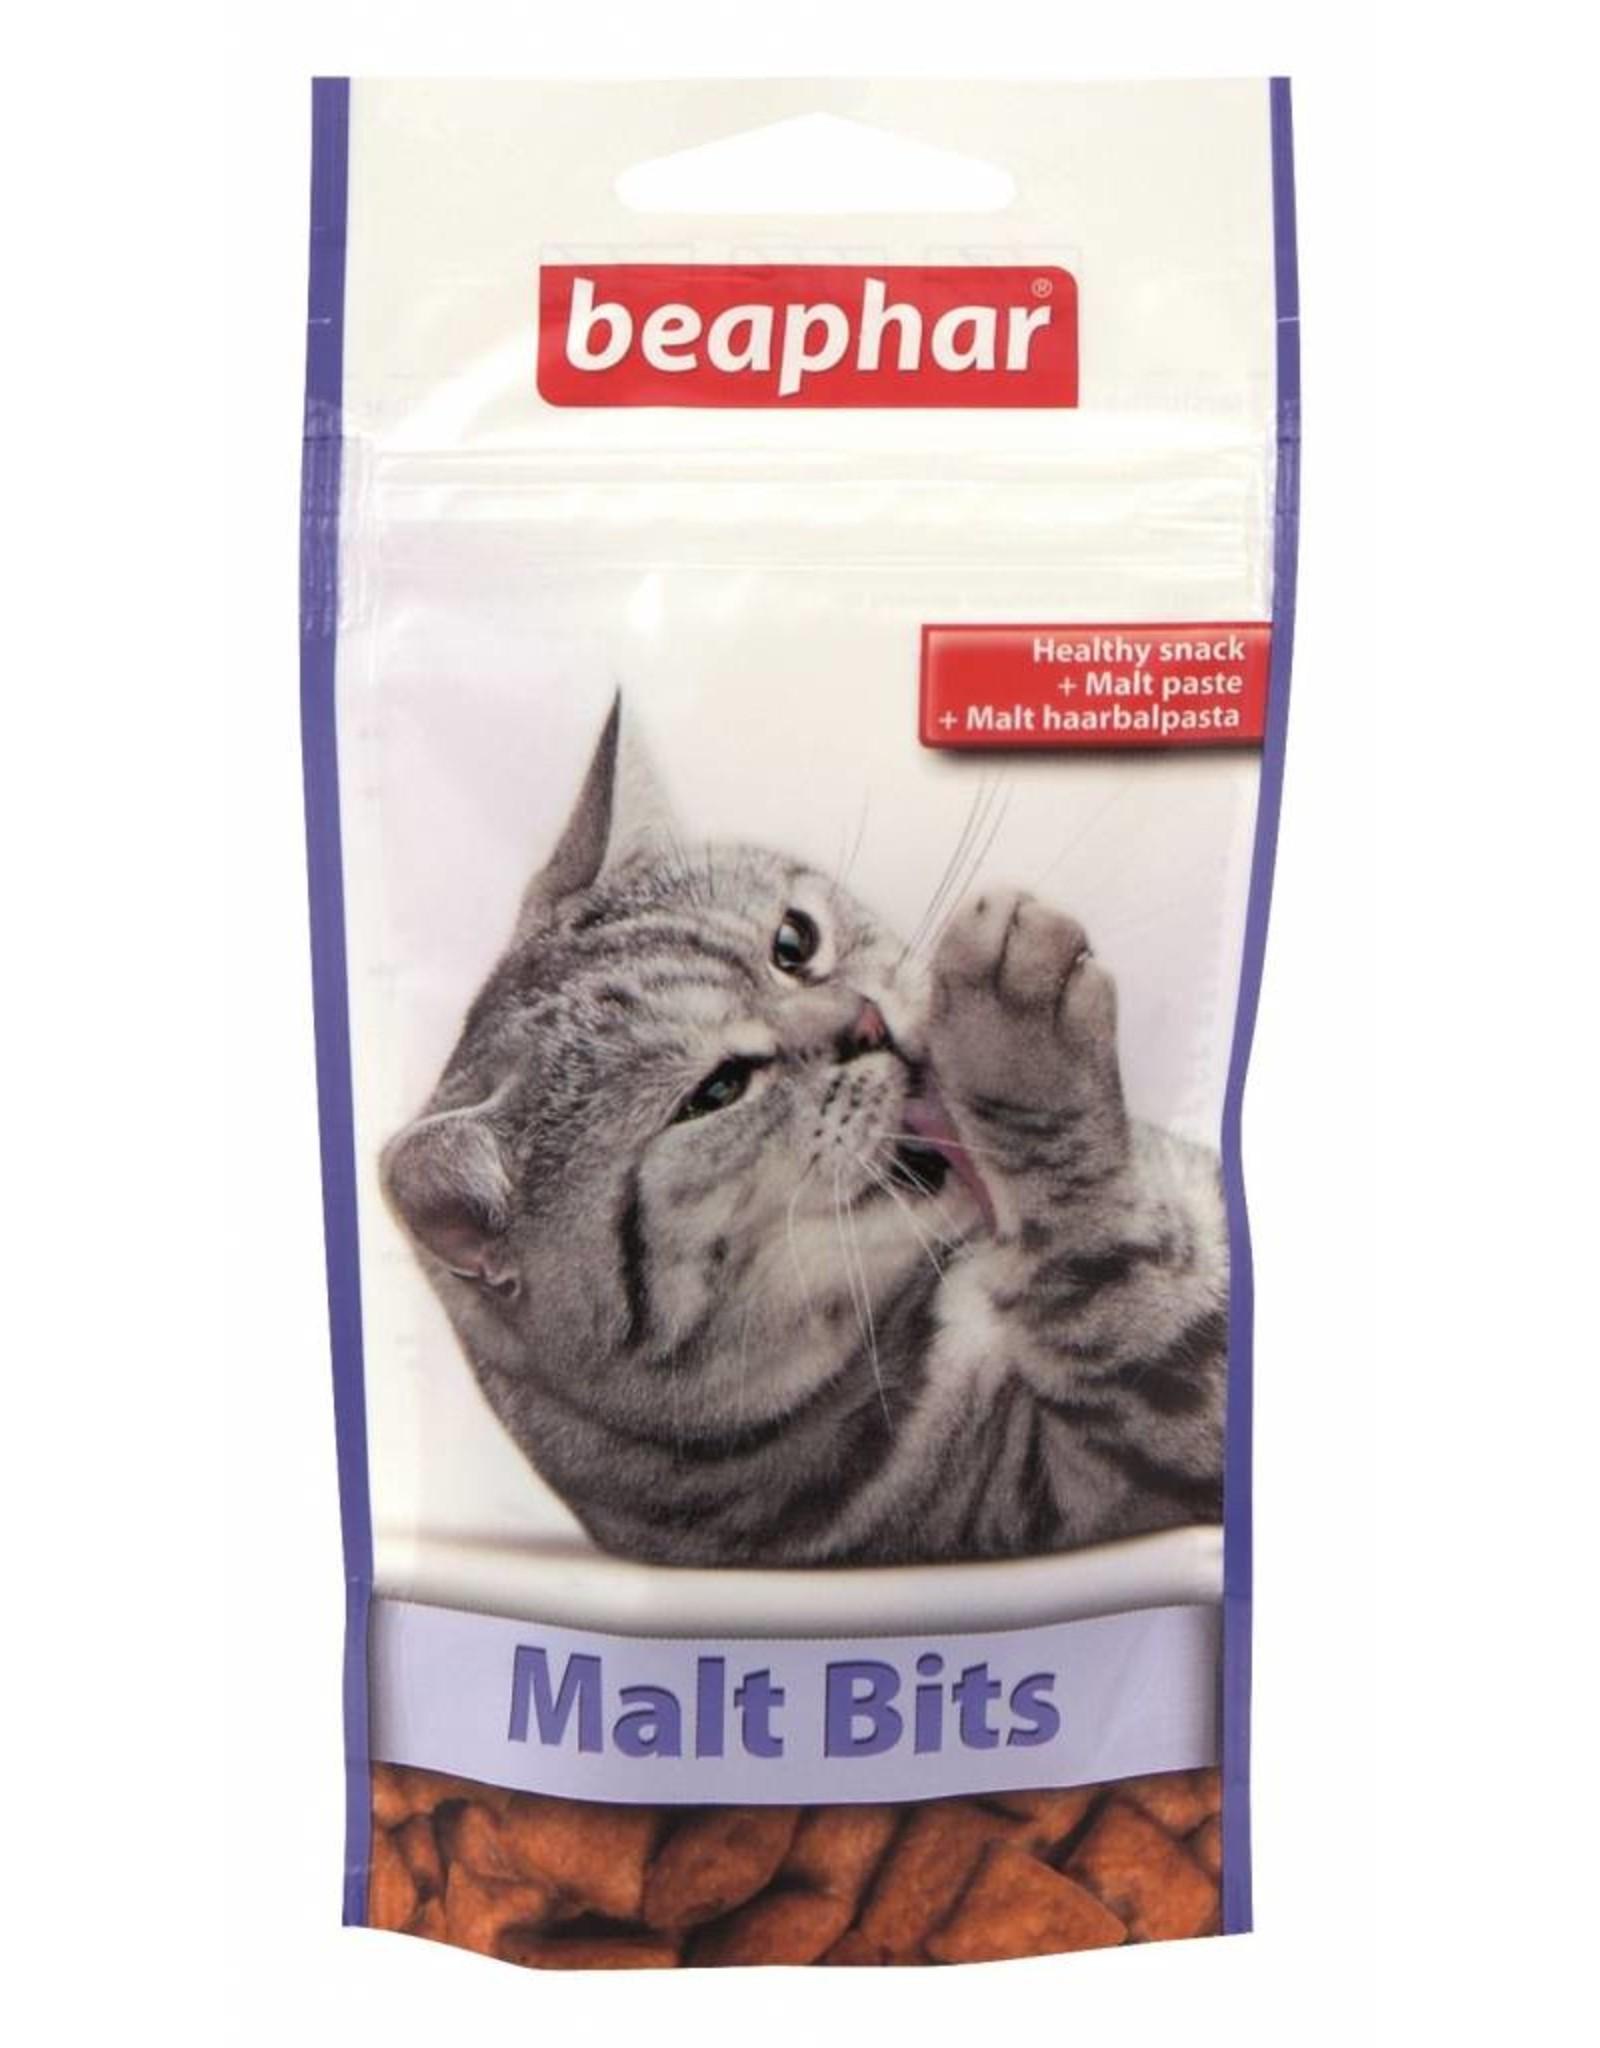 Beaphar Malt Bits Cat Treats, 35g